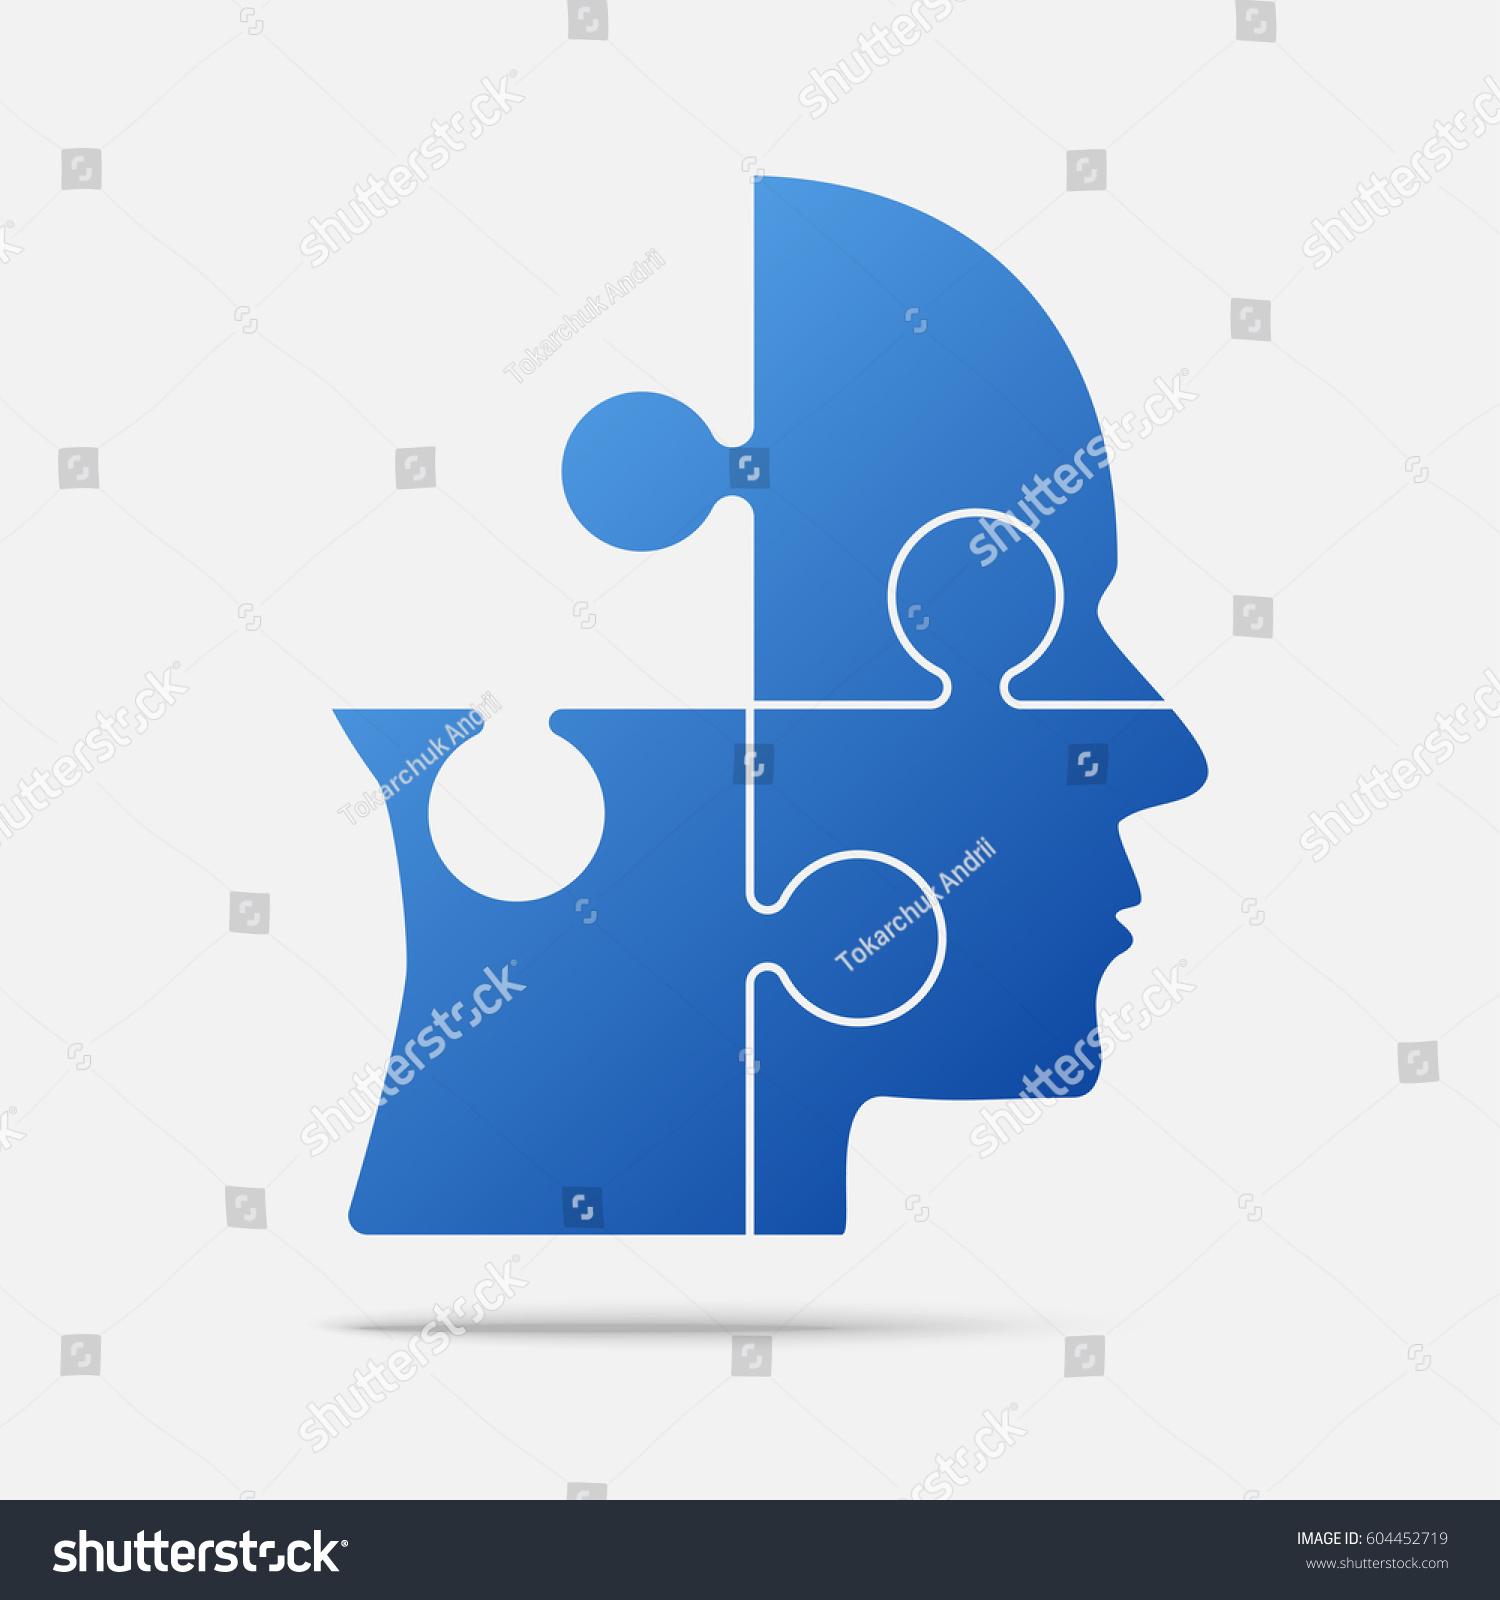 Vector Silhouette Head Puzzle 3 Pieces Image Vectorielle De Stock